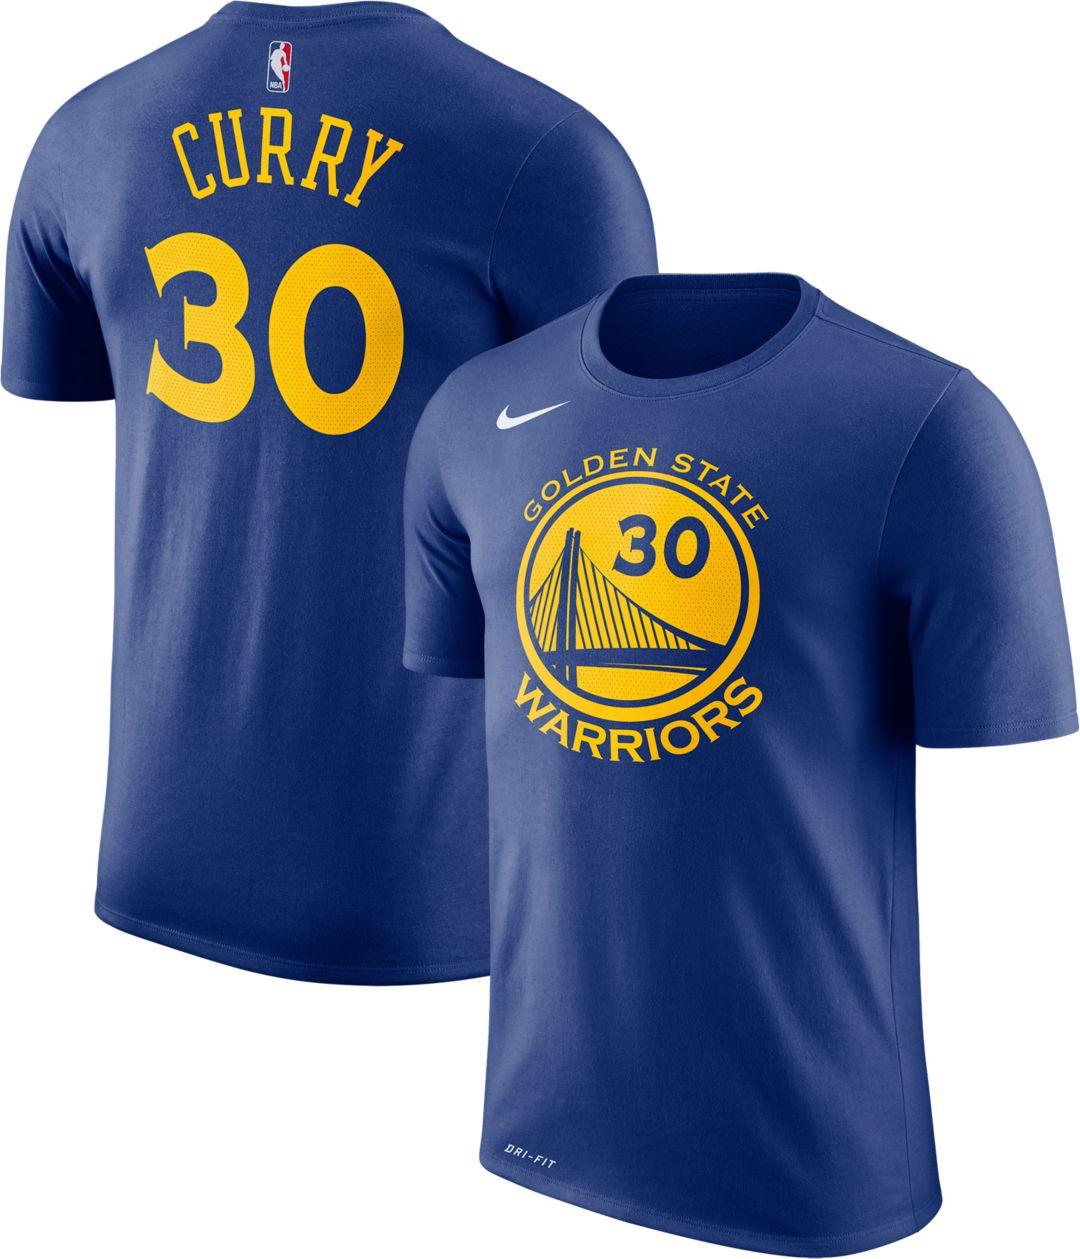 8a814188c3d Nike Men's Golden State Warriors Stephen Curry #30 Dri-FIT Royal T-Shirt